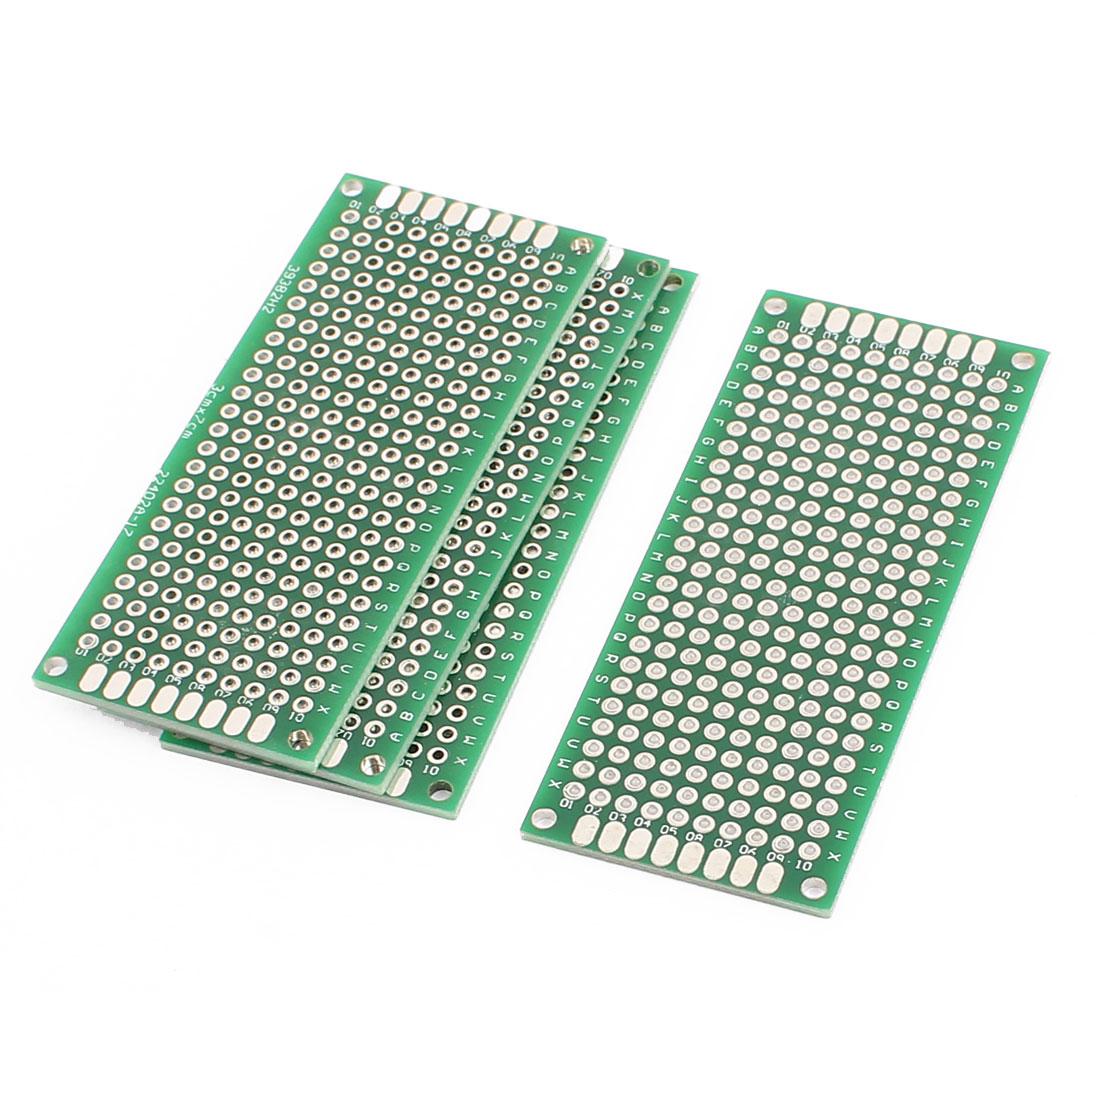 4 Pcs 3 x 7cm Double-Side Prototype Solderable Paper Universal PCB Board